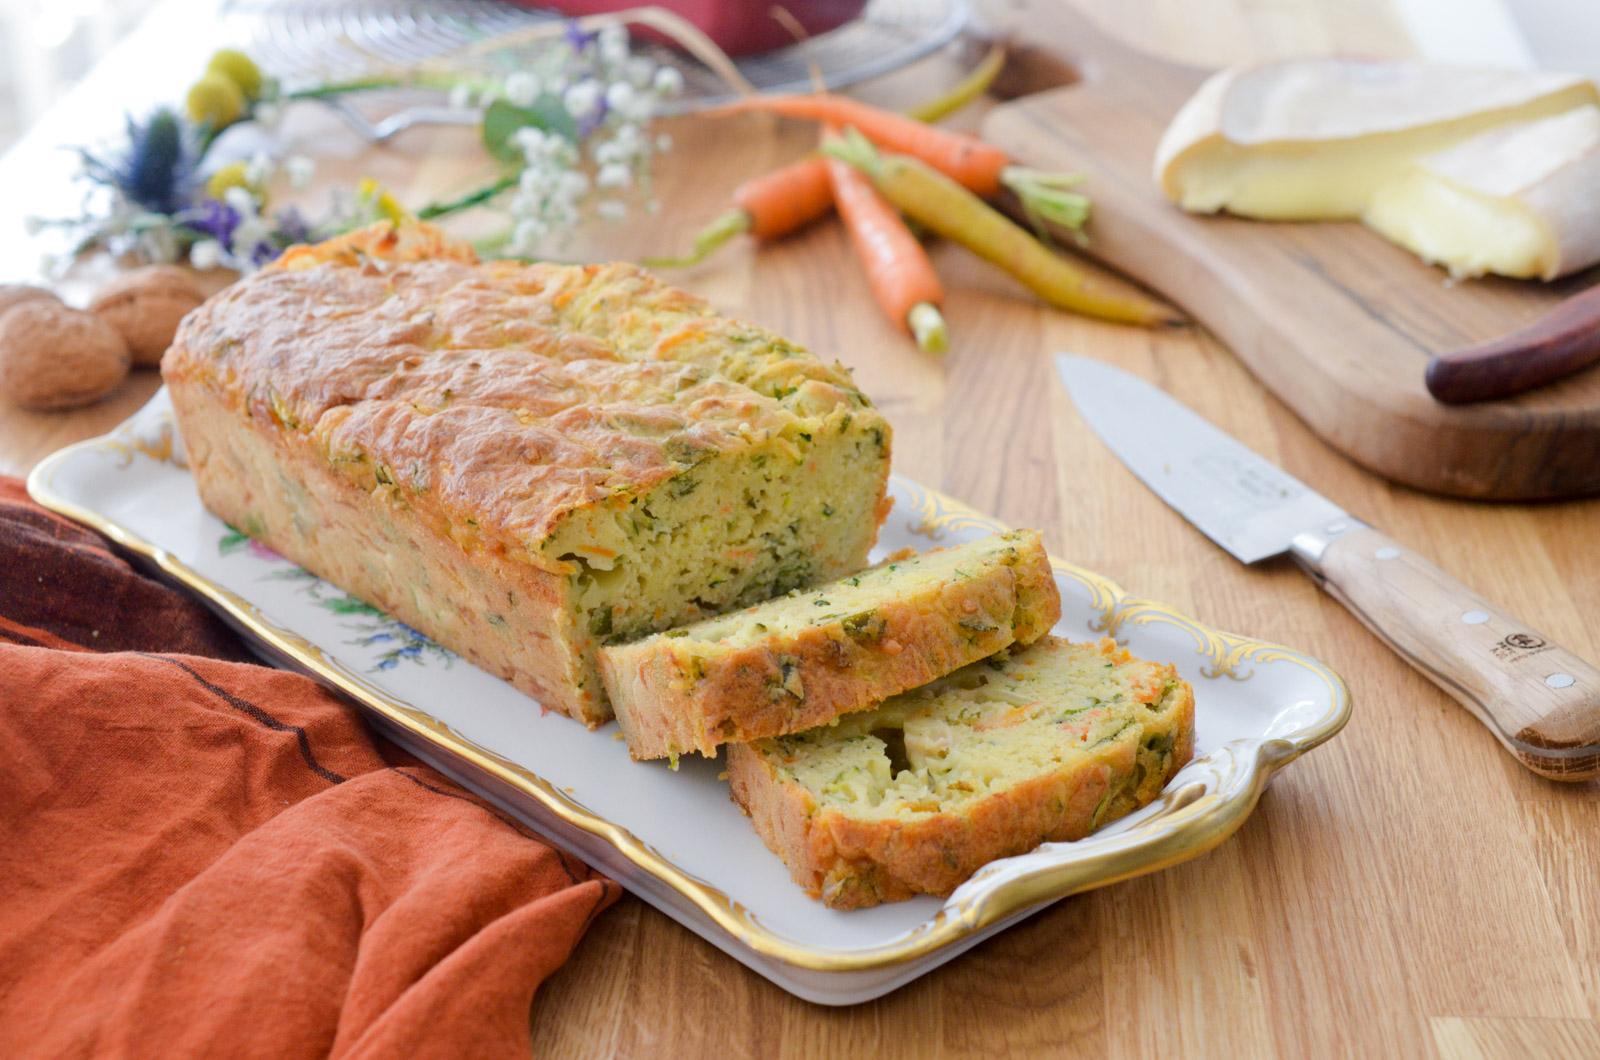 Cake fondant au reblochon courgette, carotte, cumin